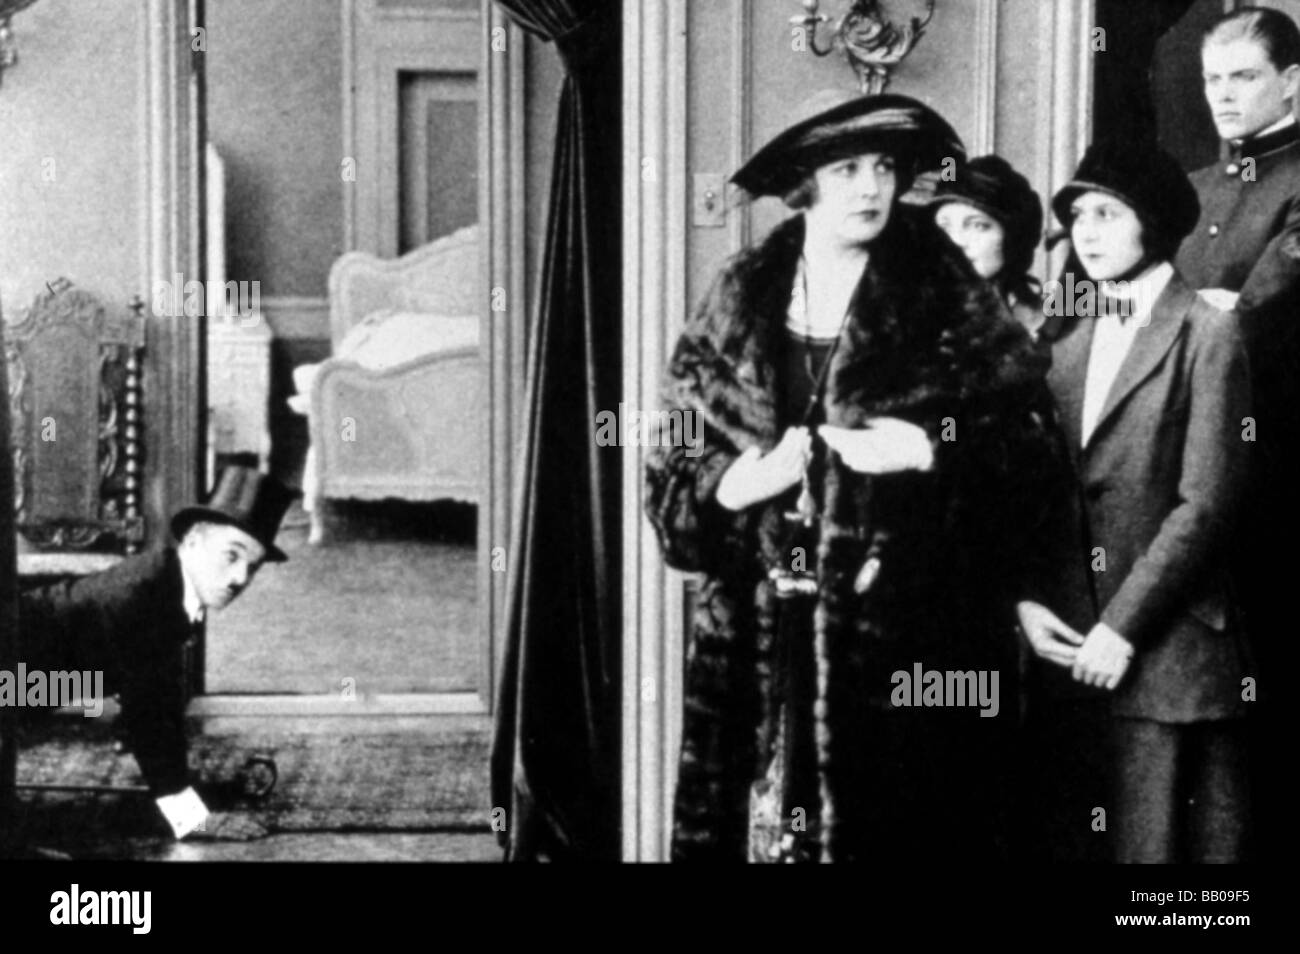 The idle class / Vanity Fair Year : 1921 Director : Charlie Chaplin Charlie Chaplin, Edna Purviance - Stock Image